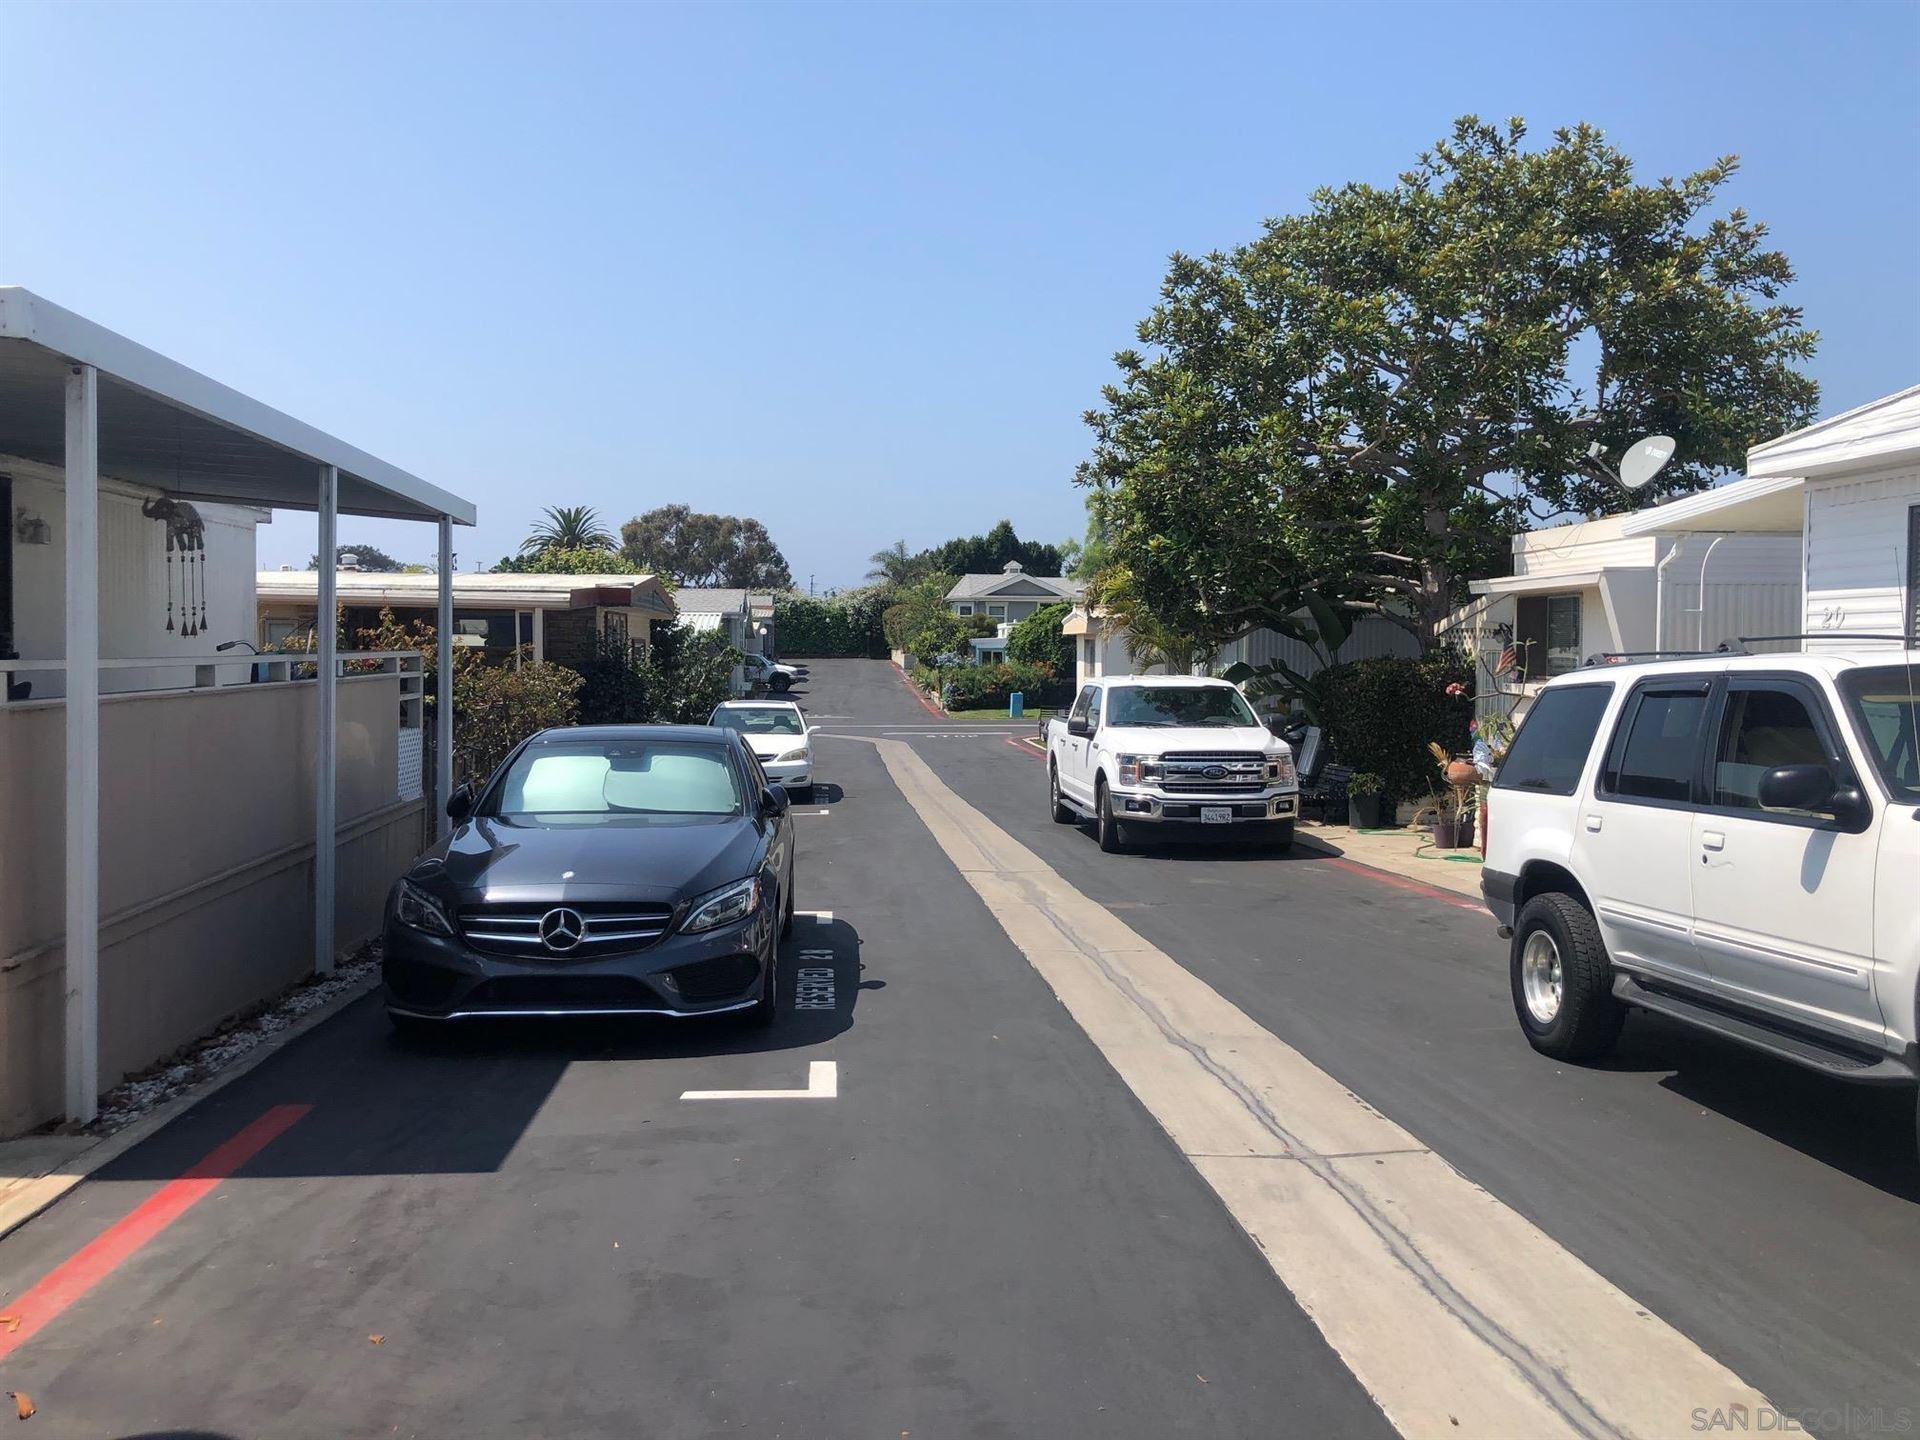 Photo of 699 N Vulcan Ave #20, Encinitas, CA 92024 (MLS # 210025848)